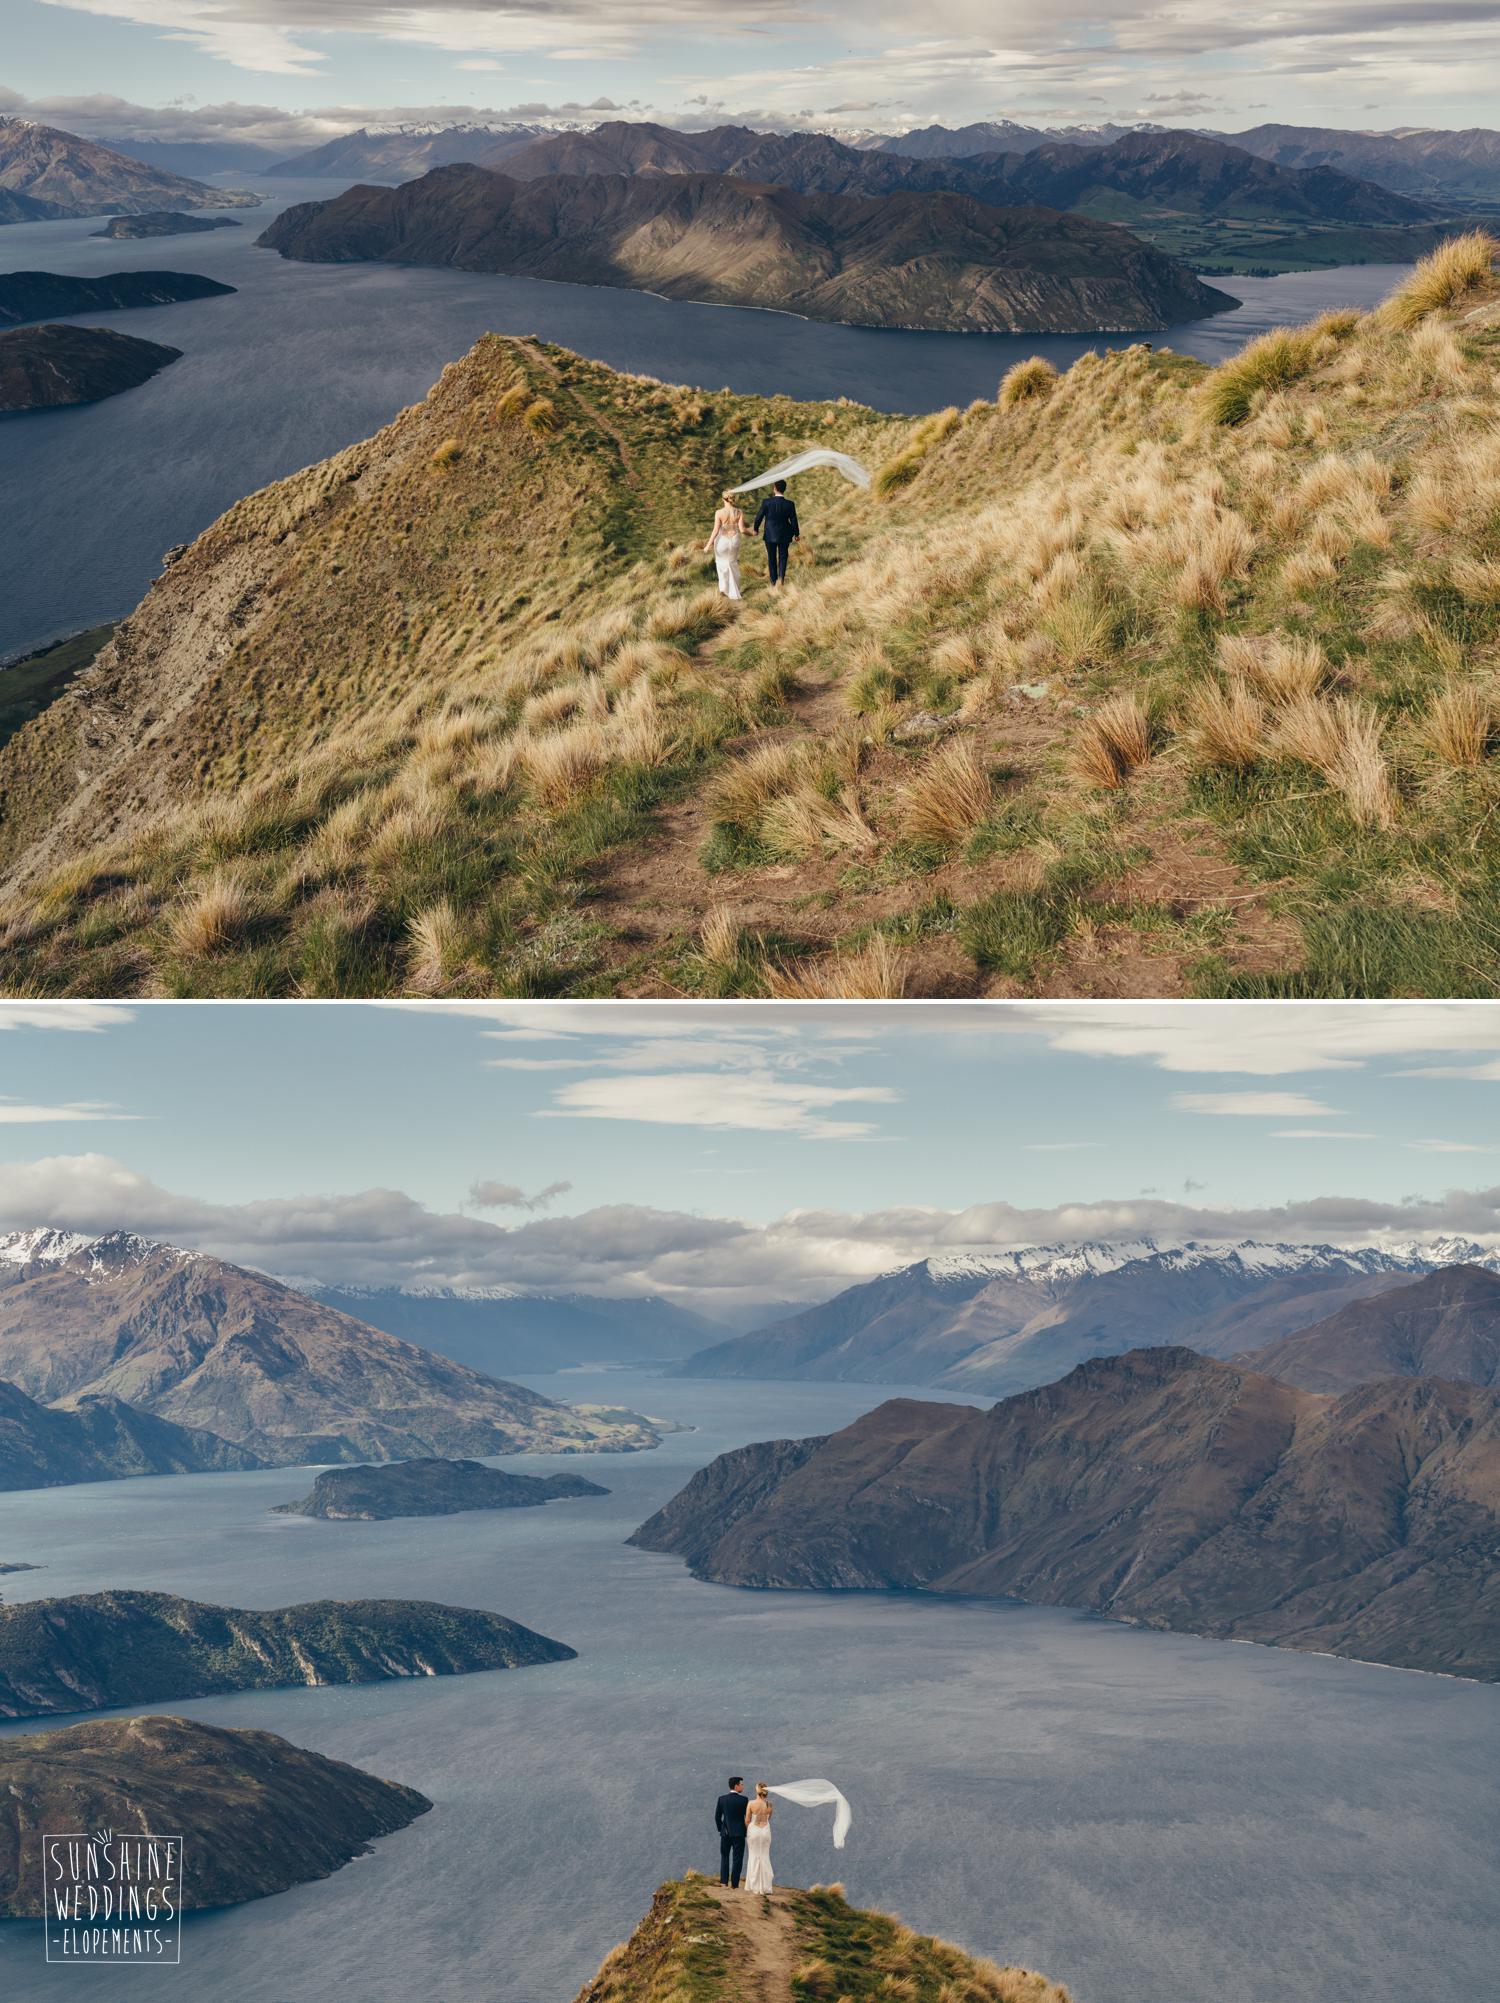 Spectacular NZ scenery, mountain wedding